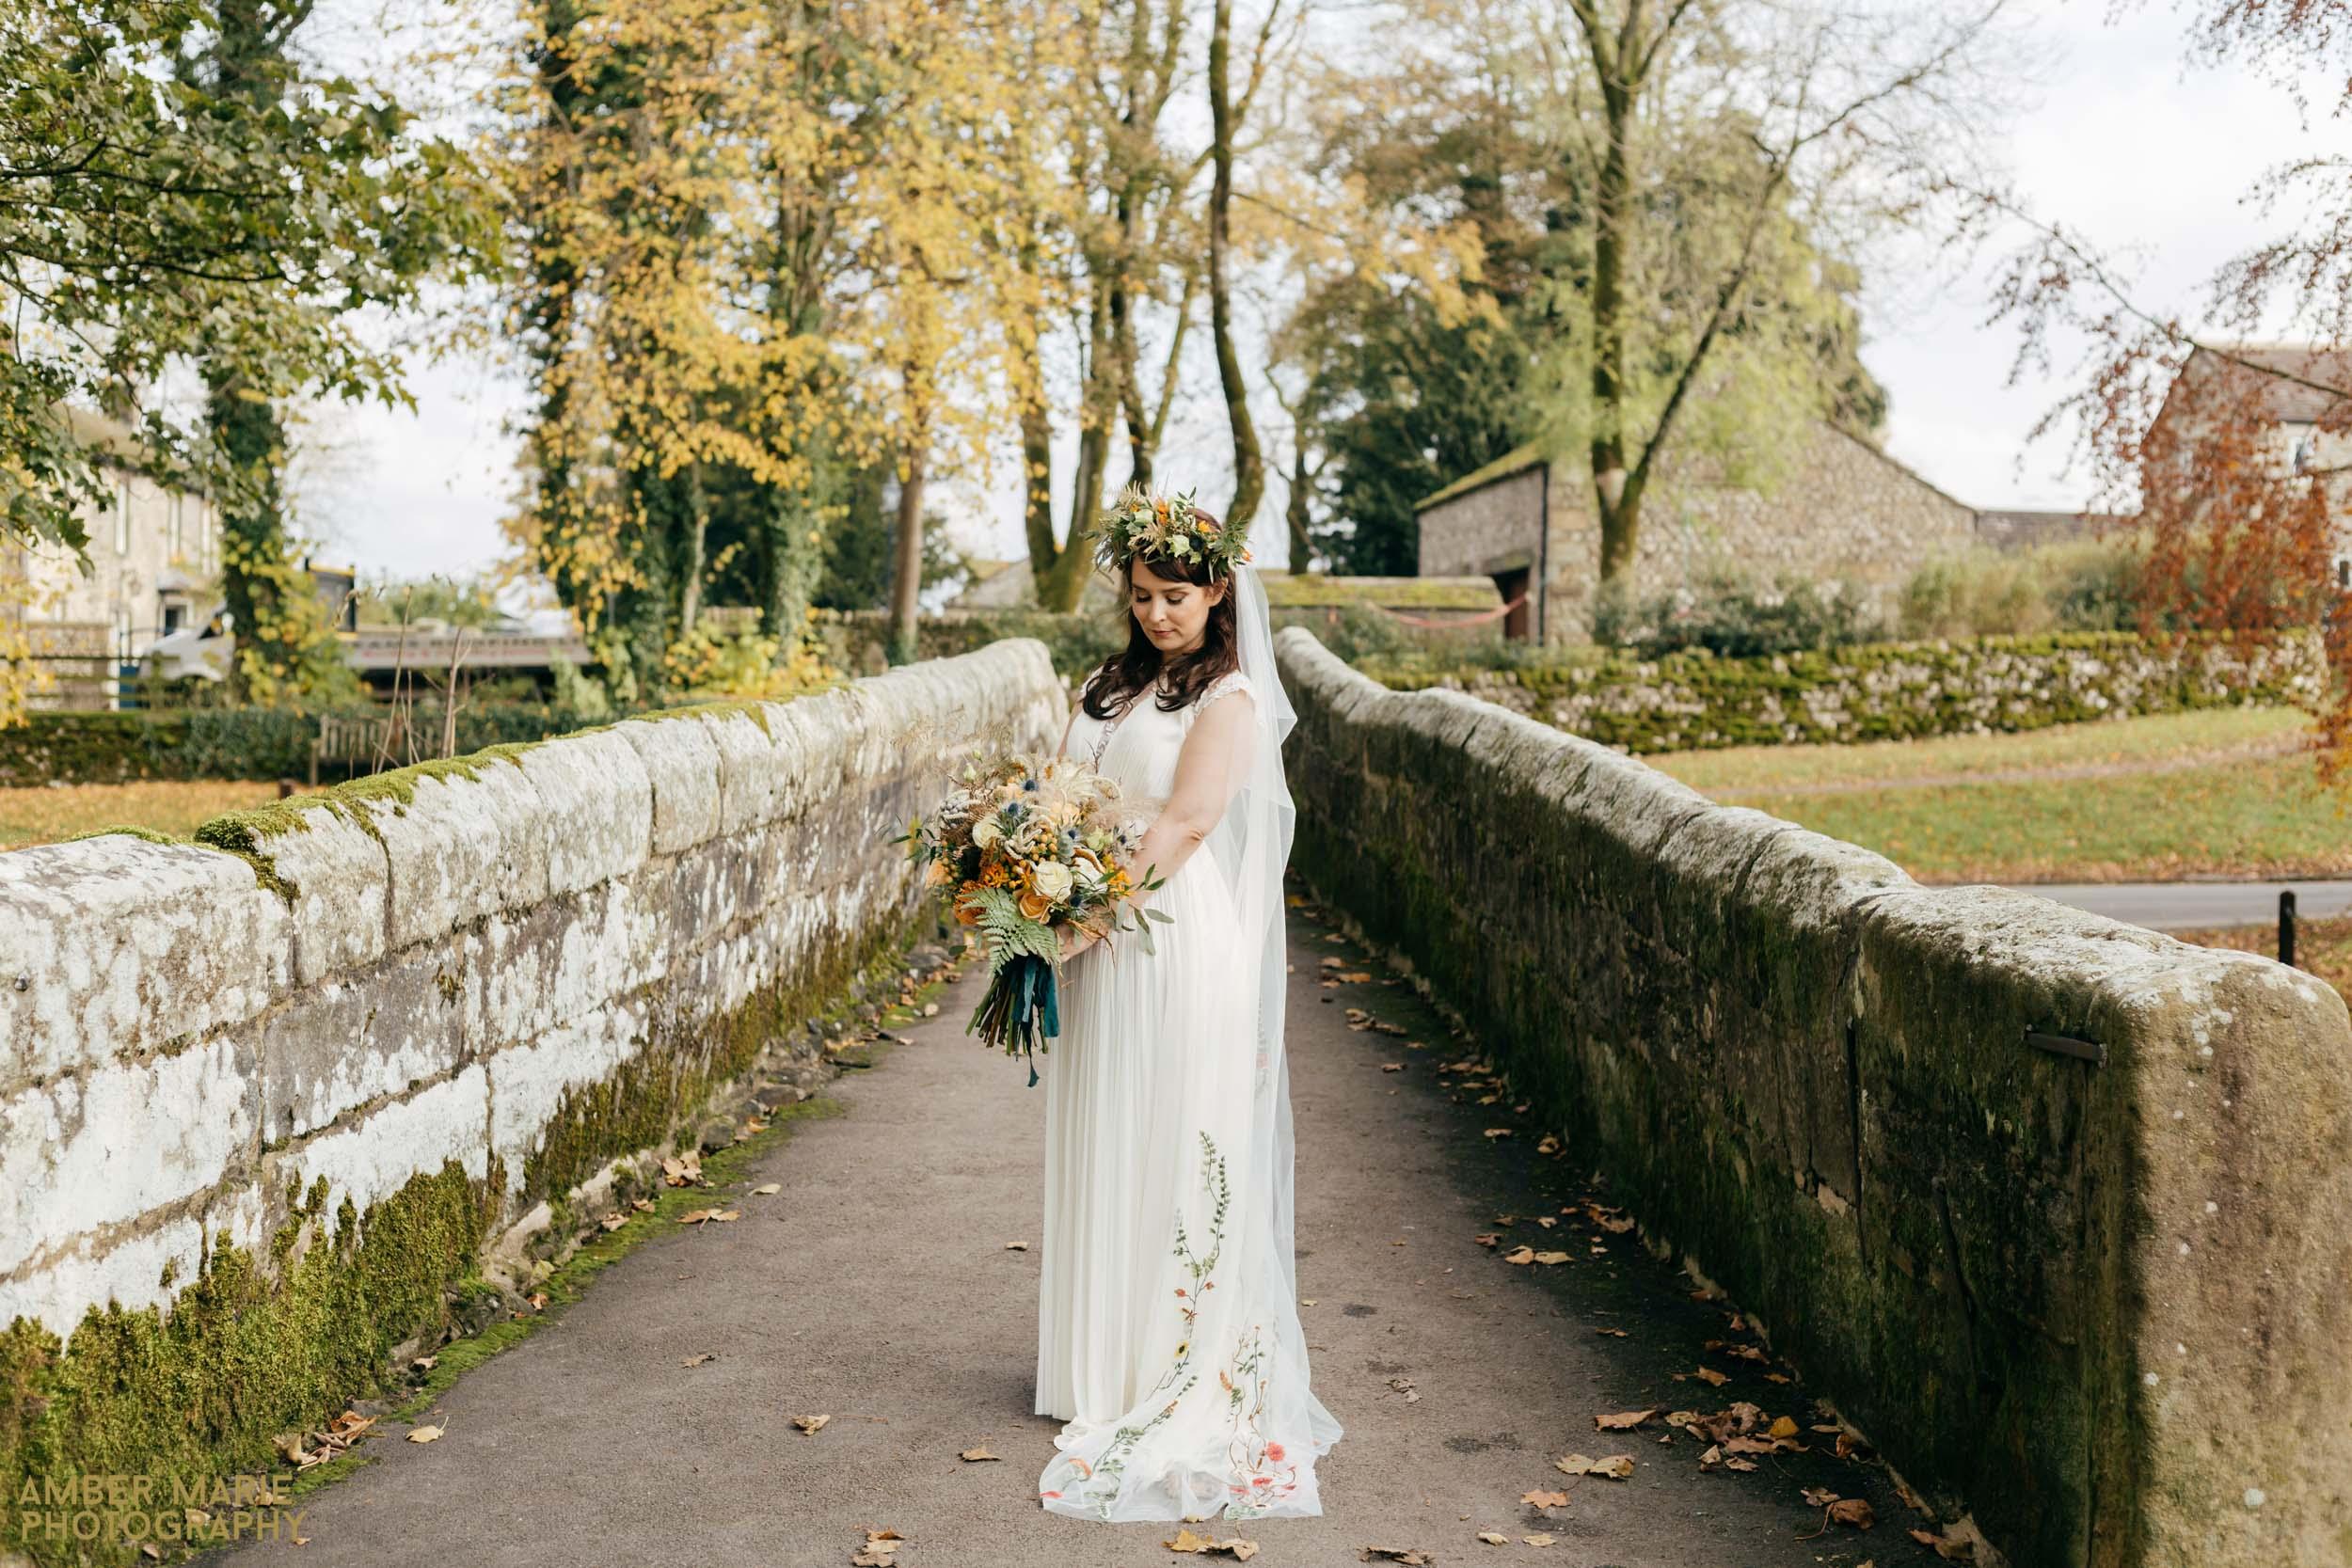 Stylish Halloween Wedding at Cruck Barn